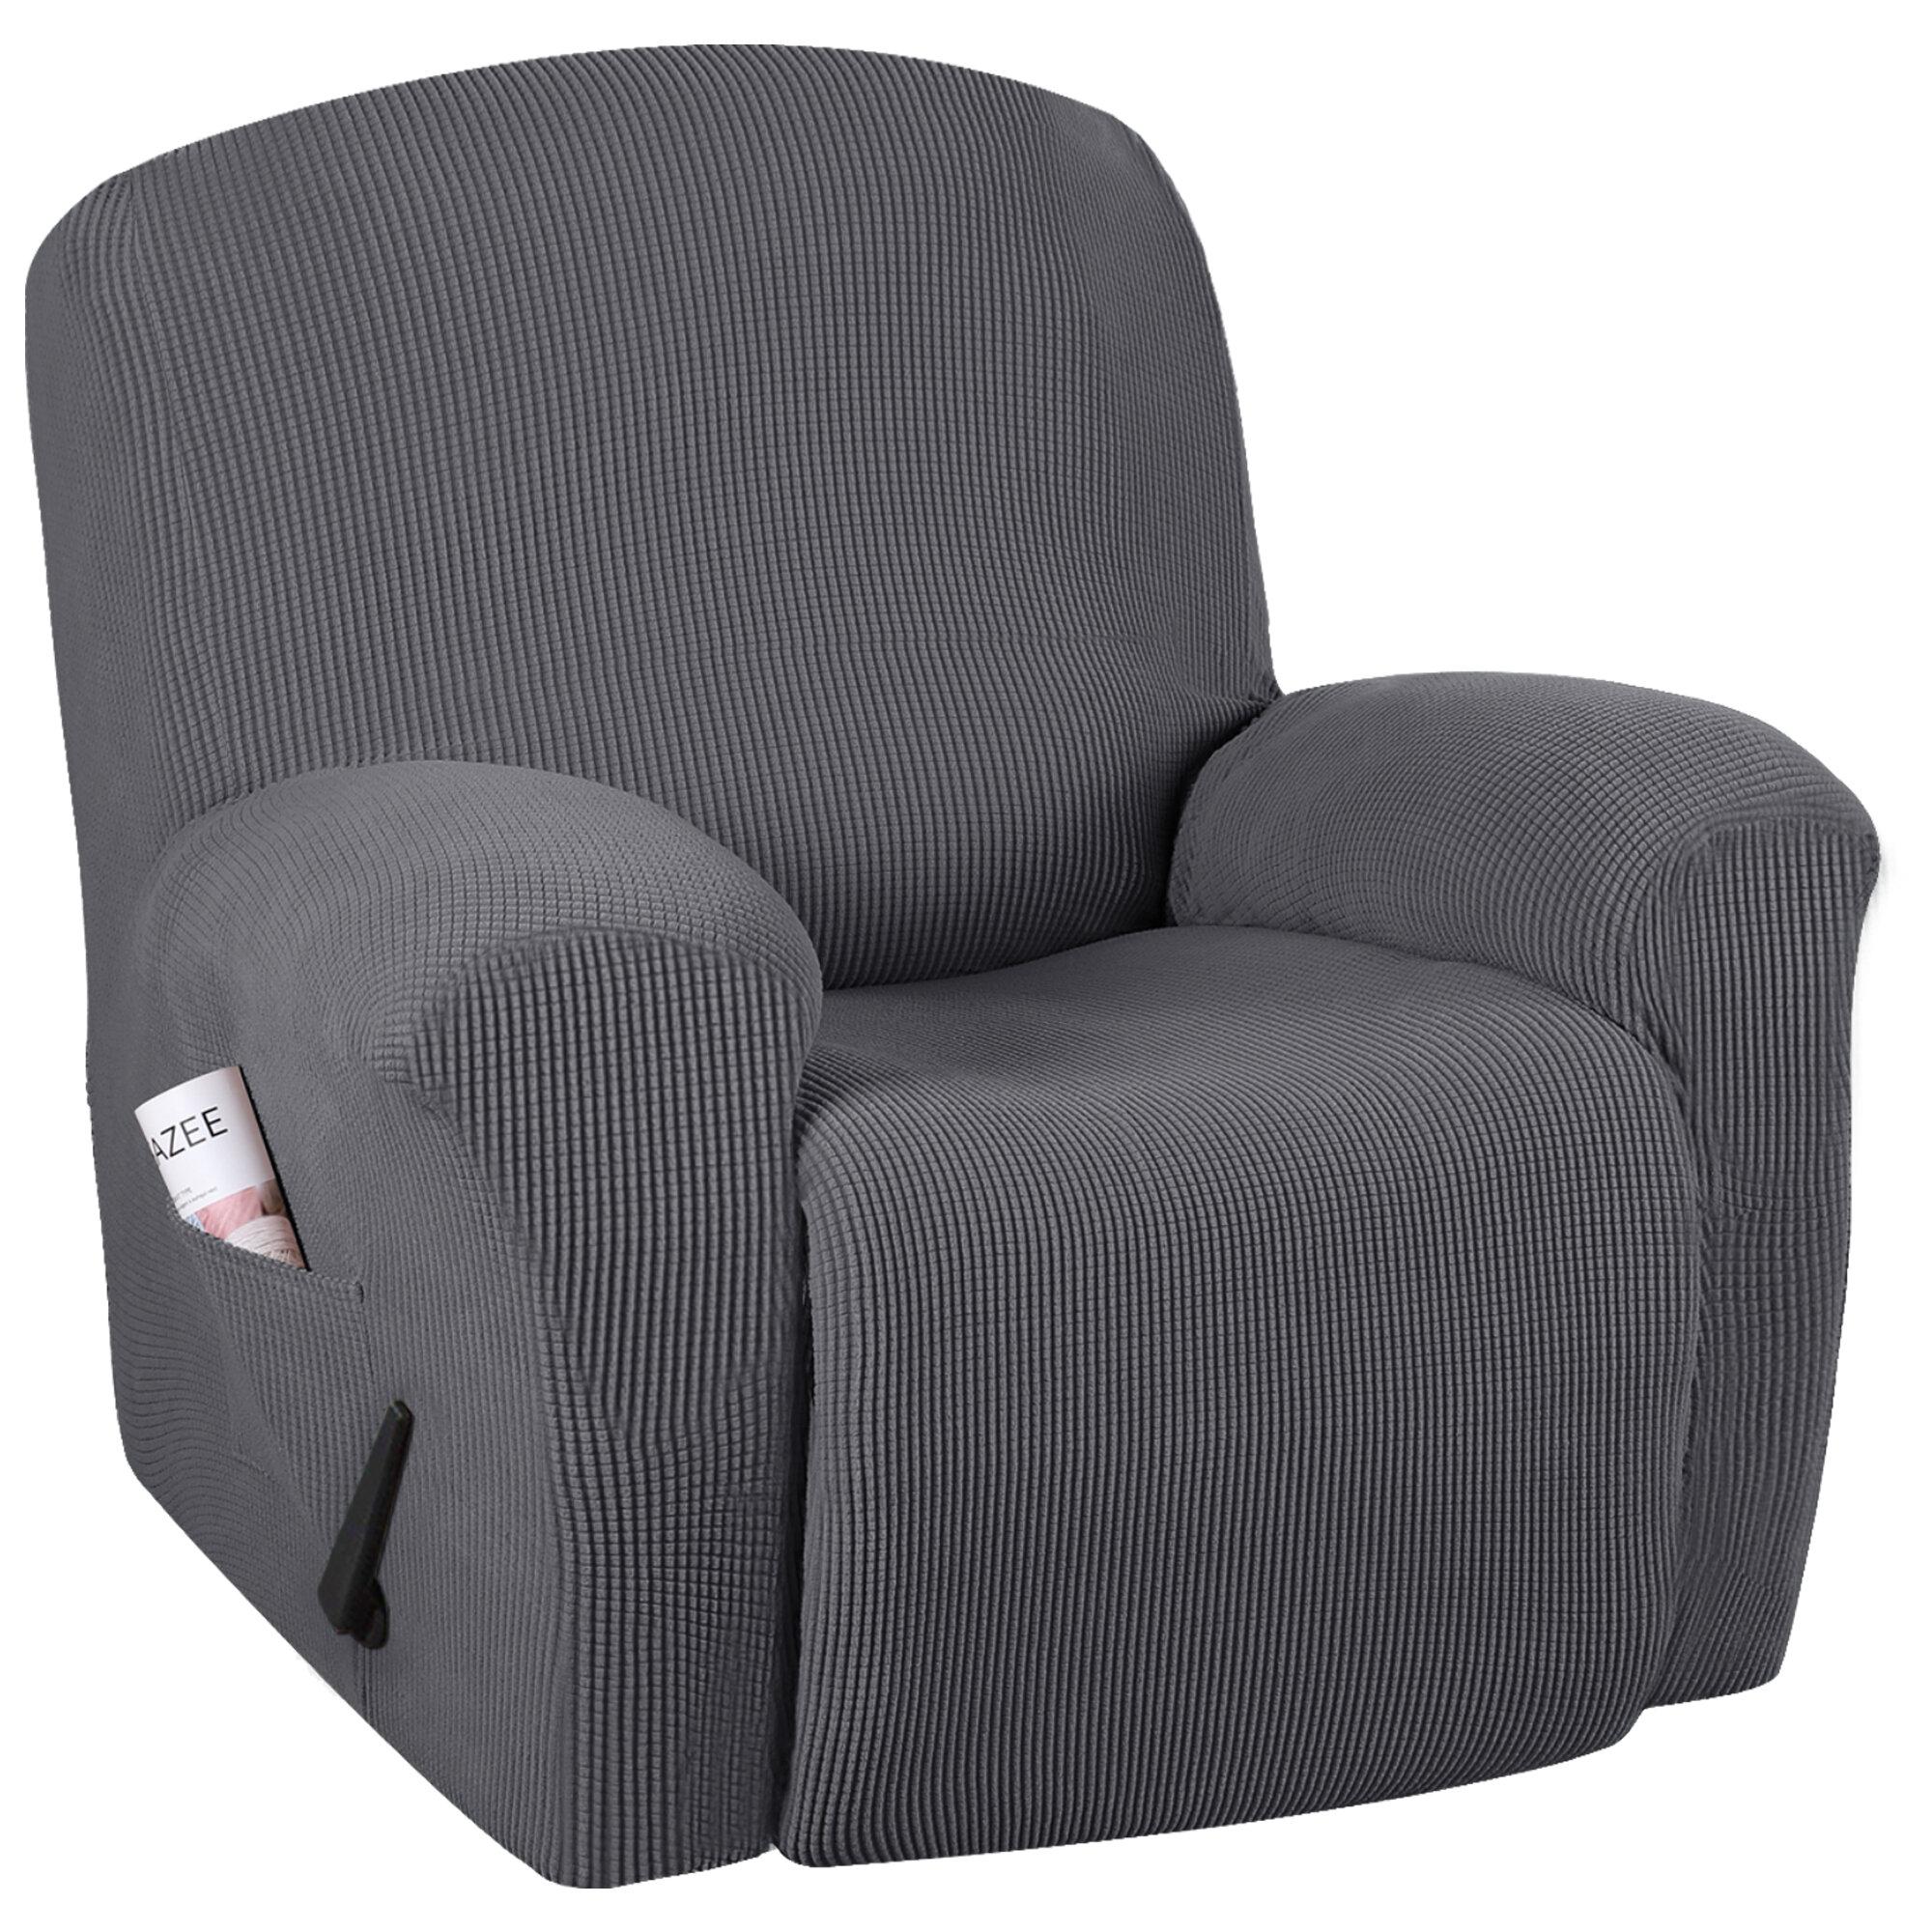 Red Barrel Studio Spandex Box Cushion Recliner Slipcover Reviews Wayfair